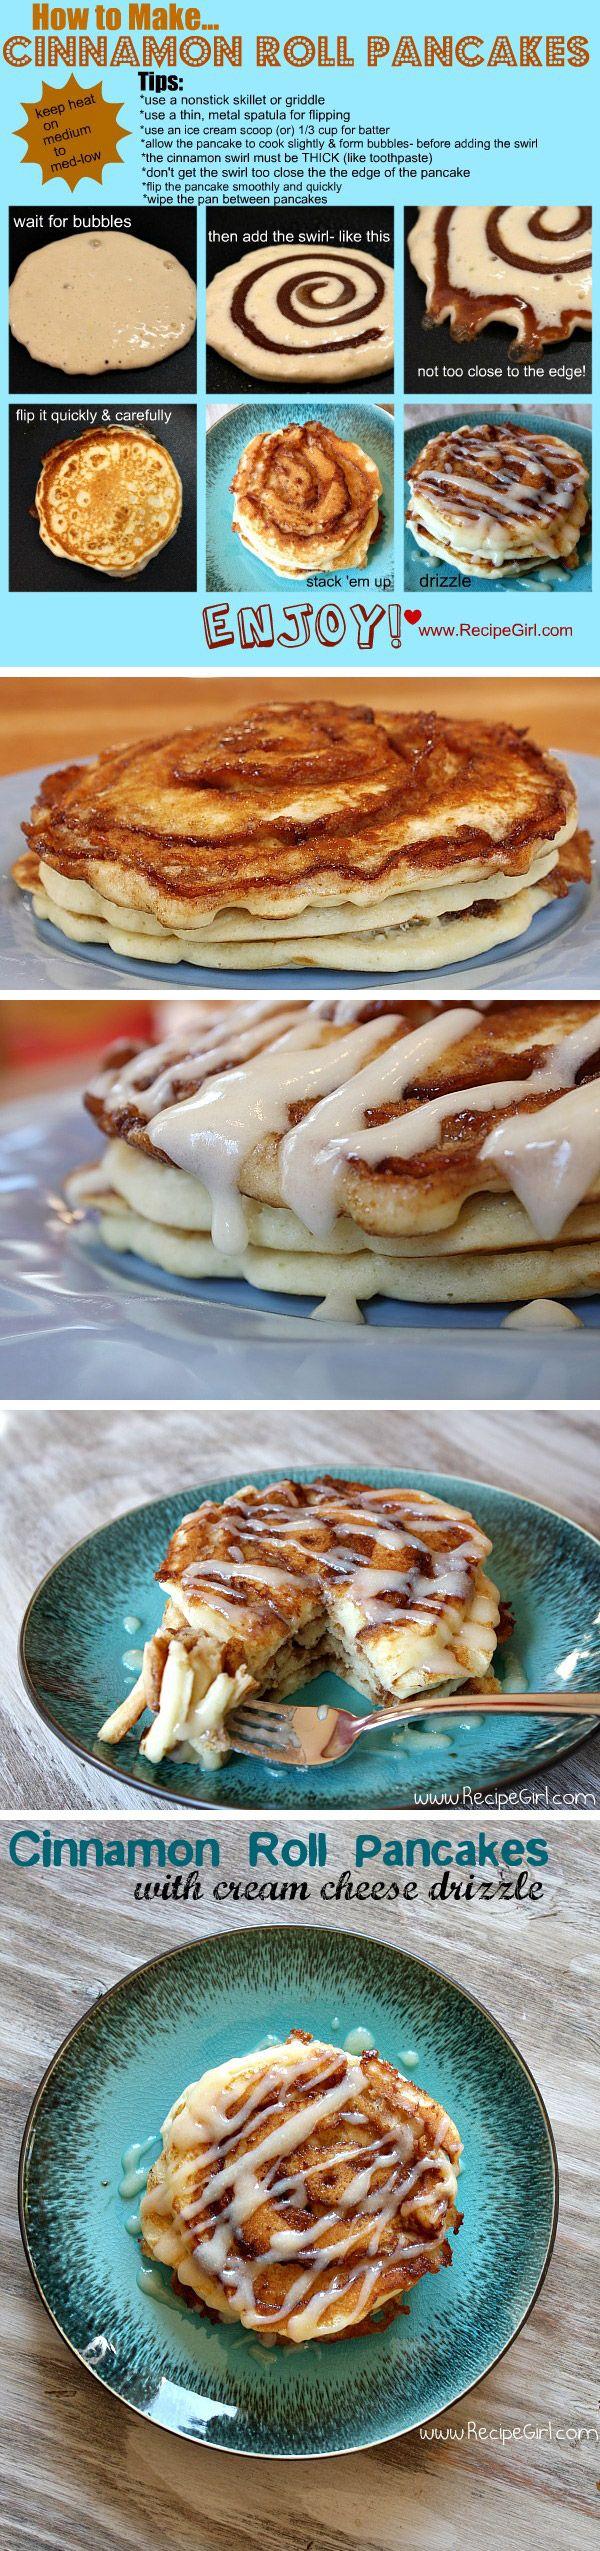 ladies wallets Cinnamon Roll pancakes  Yummy Food amp Drinks